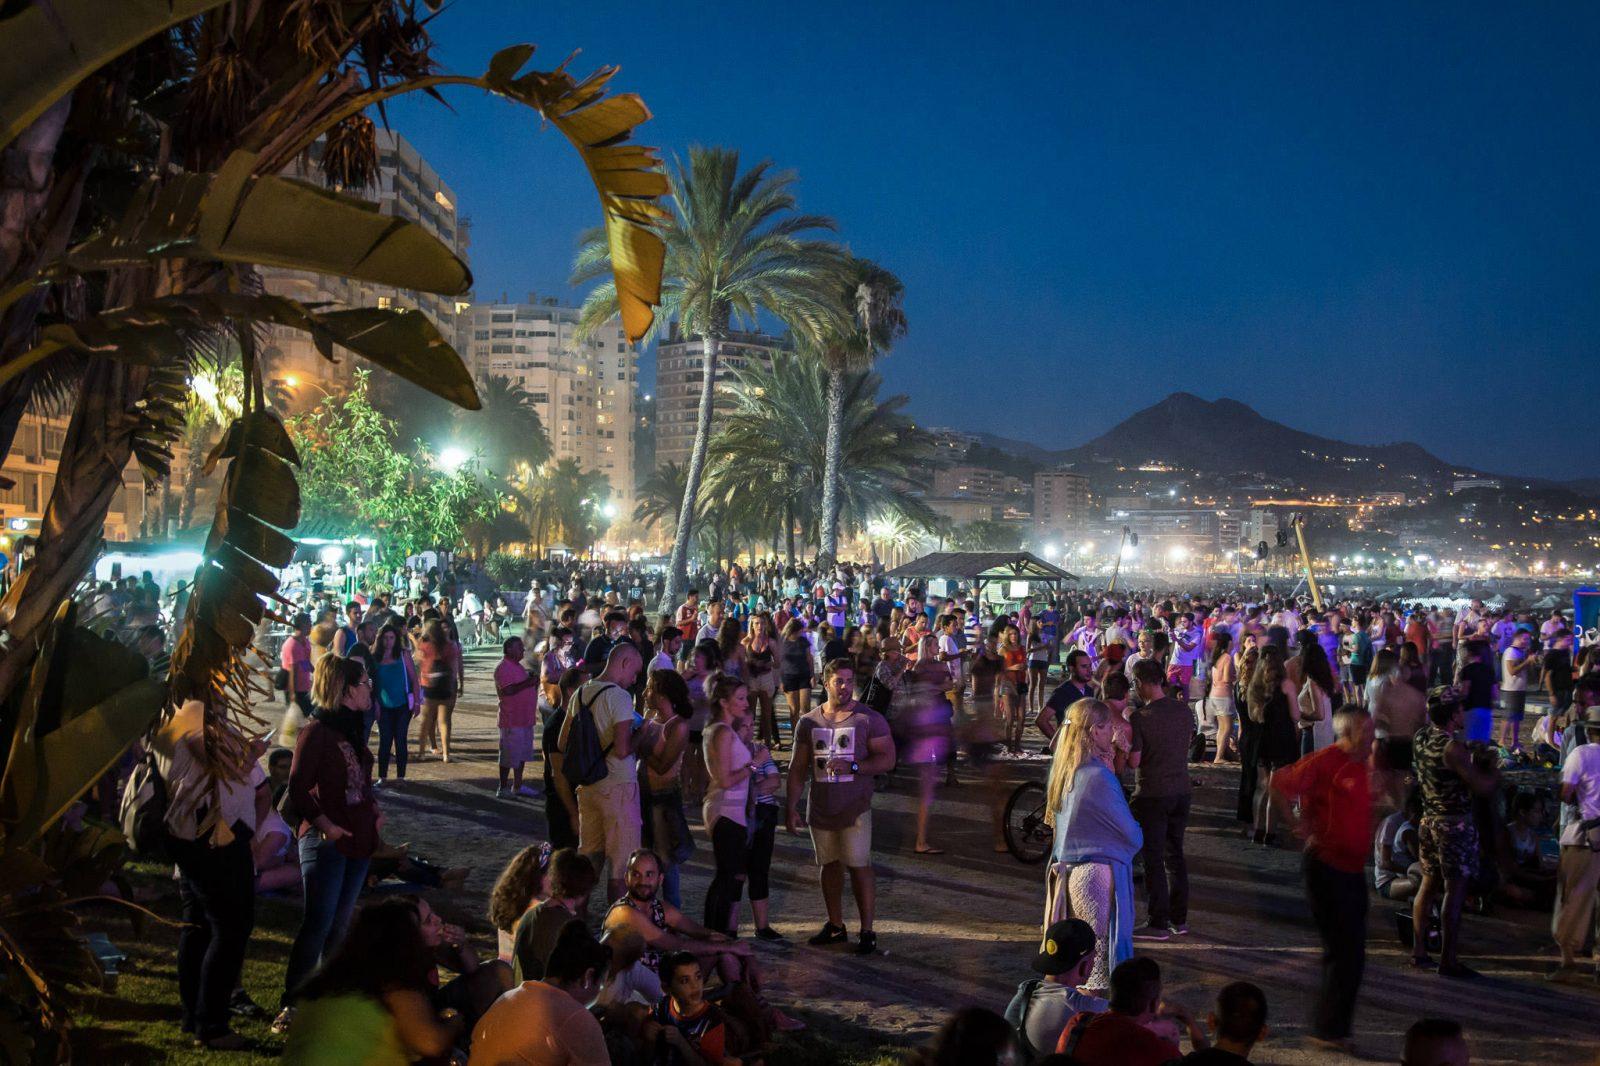 Ночь Сан-Хуана (Fiesta de San Juan) (фото: Remy Frank)